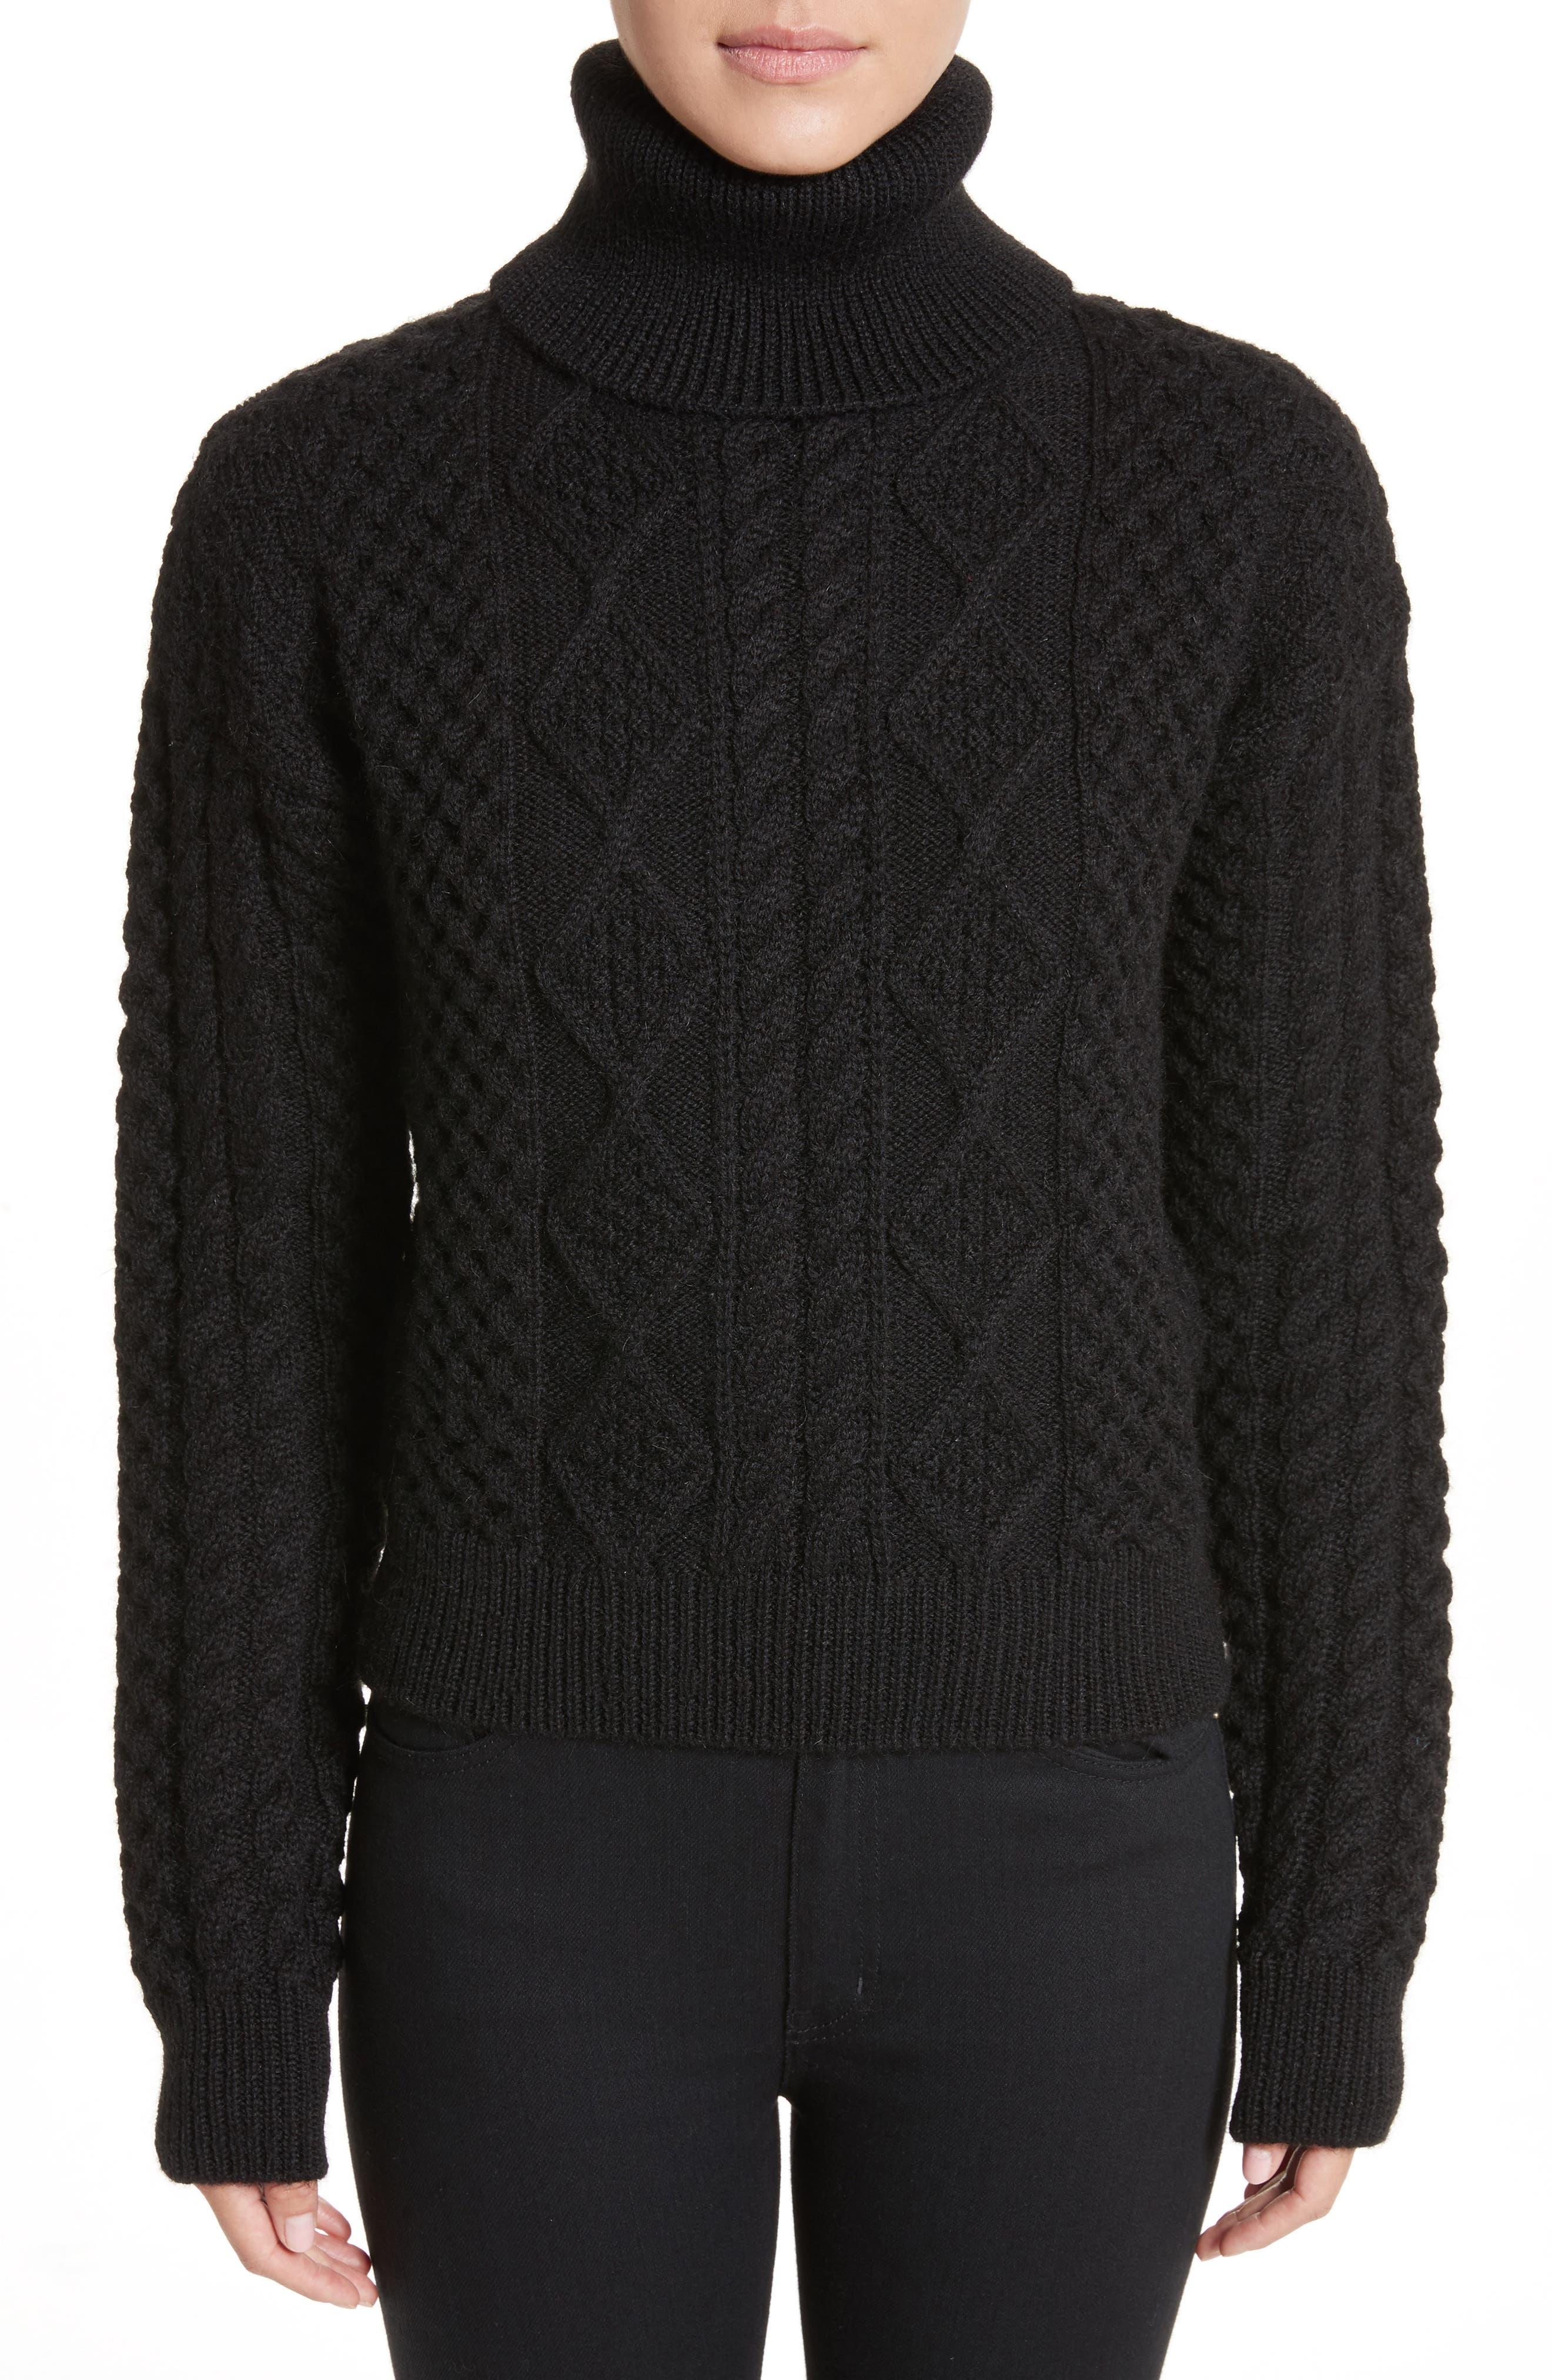 Main Image - Saint Laurent Cable Knit Wool Turtleneck Sweater